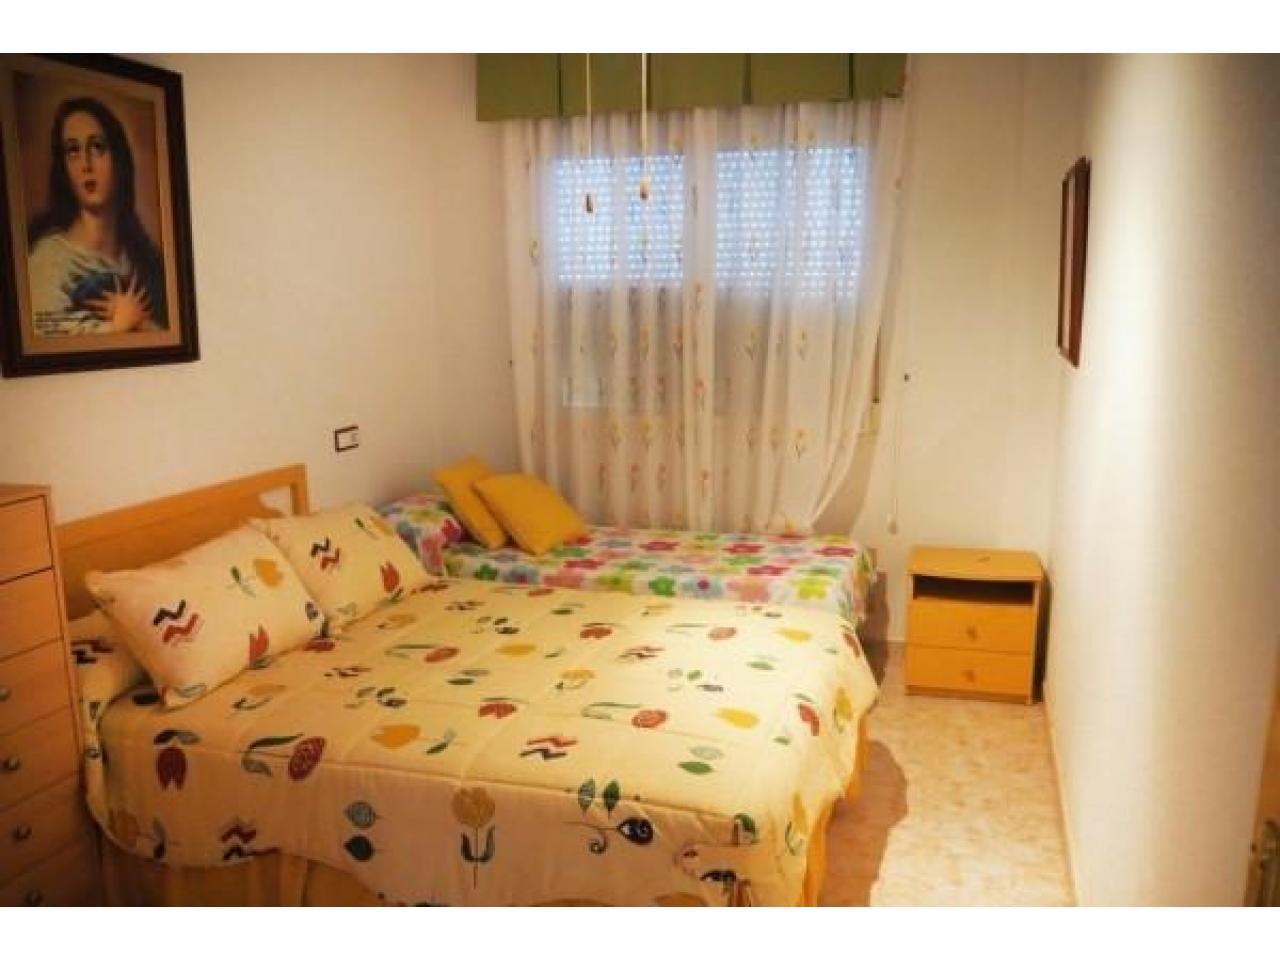 Недвижимость в Испании, Квартира c видами на море в Торревьеха,Коста Бланка,Испания - 7